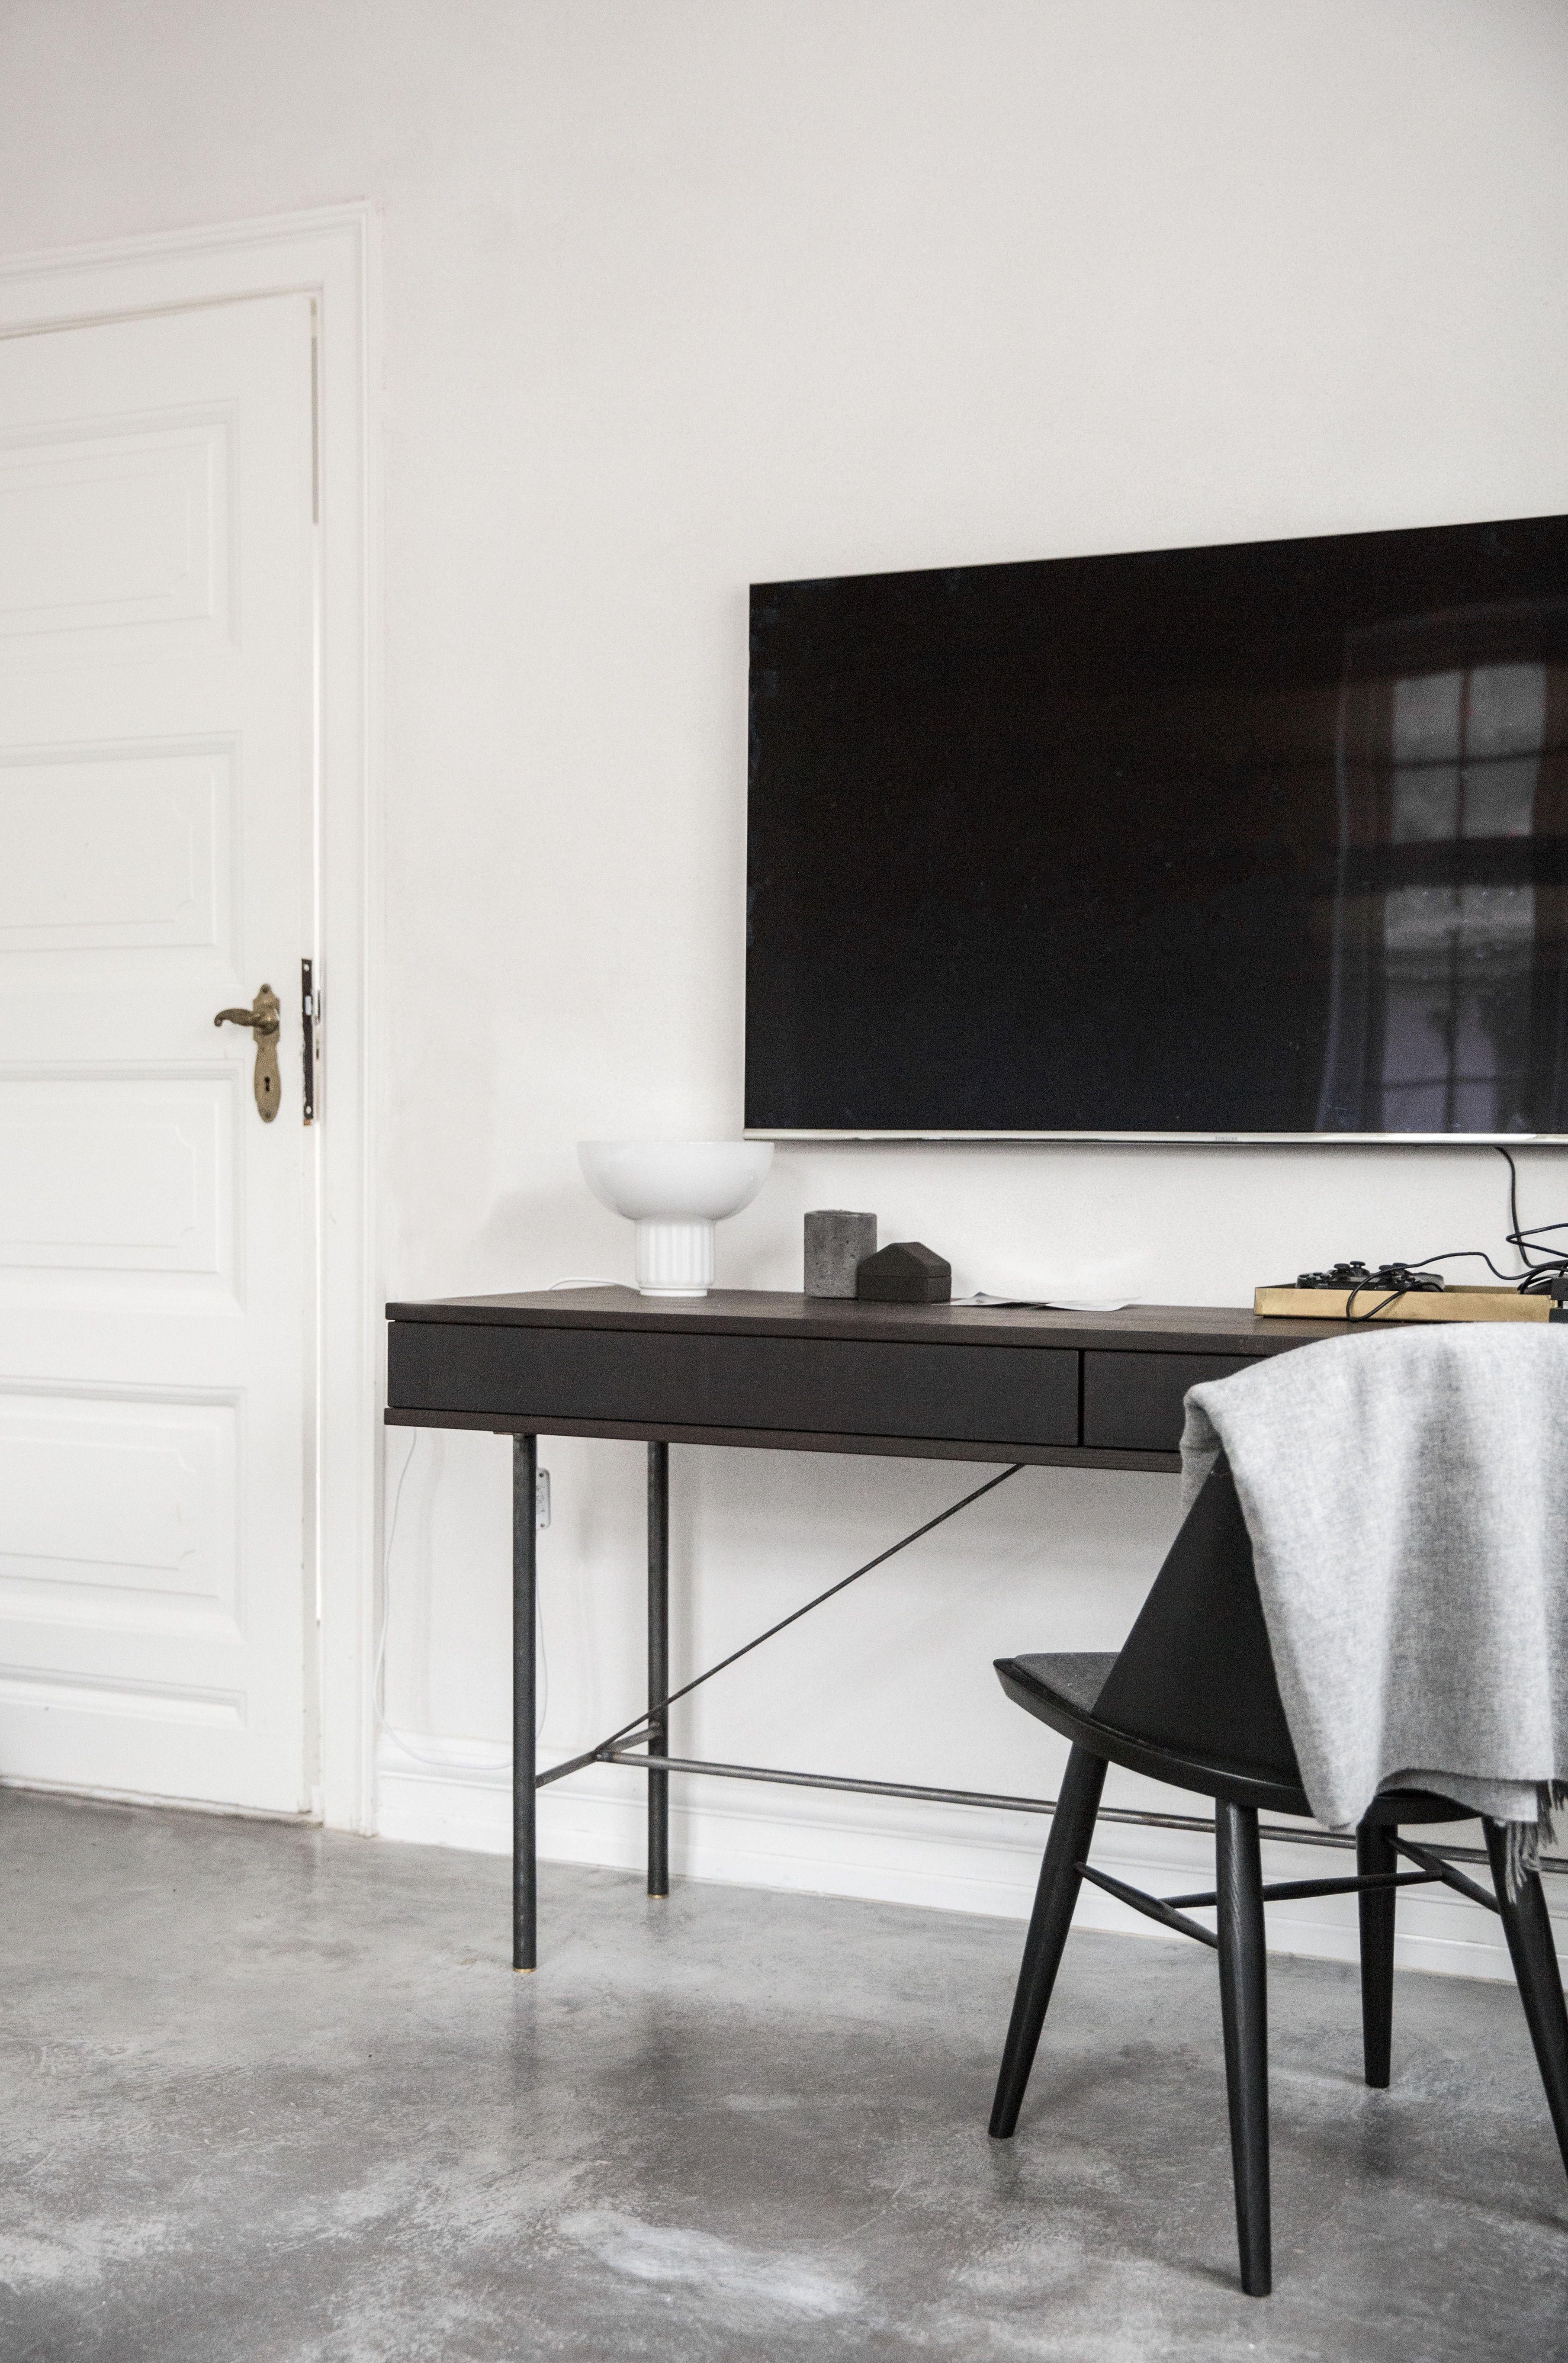 MENU Synnes Chair, The Standard Table Lamp, House | MENU I New ...